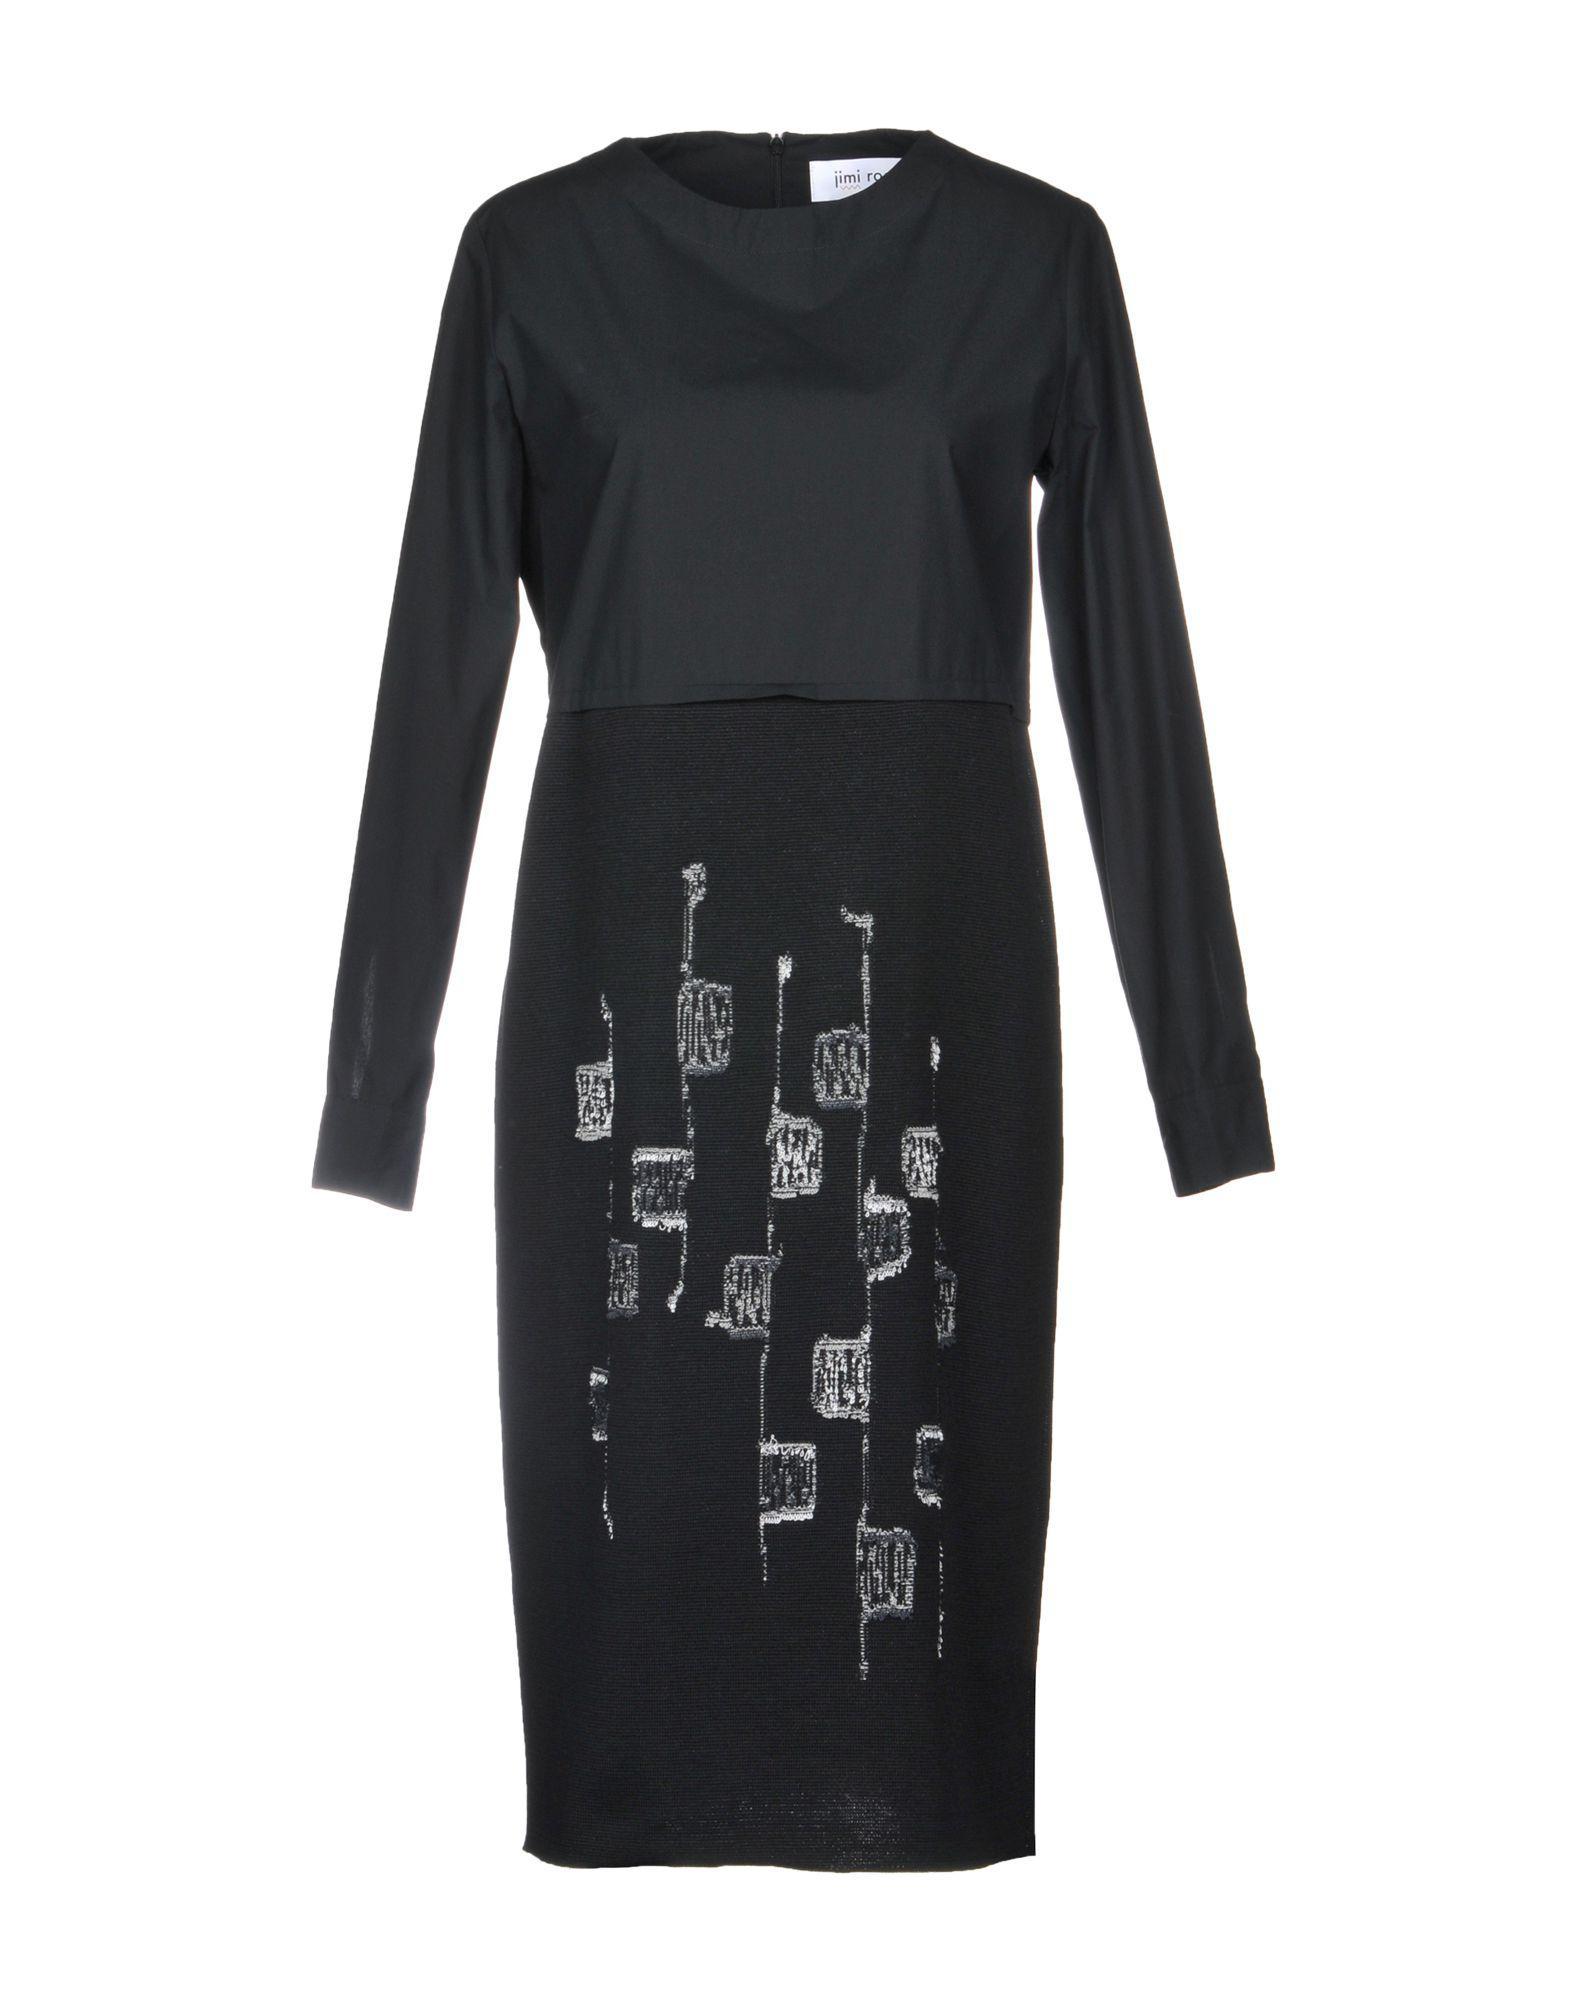 DRESSES - Knee-length dresses Jimi Roos 89xmOfm